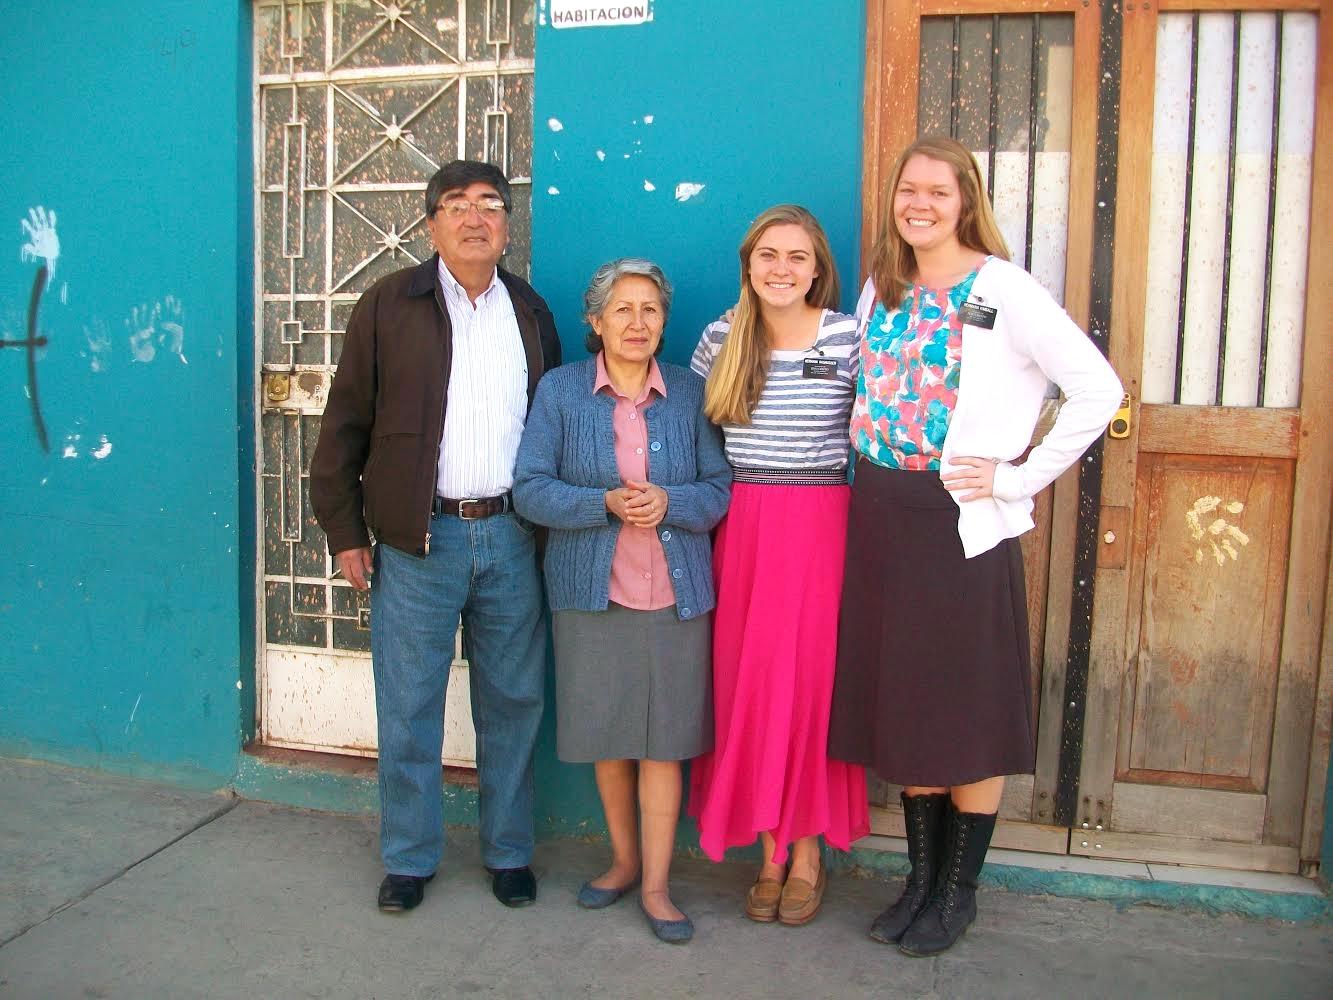 abel romo y hermana sara (with whom hermana ras & hermana kimball lived)